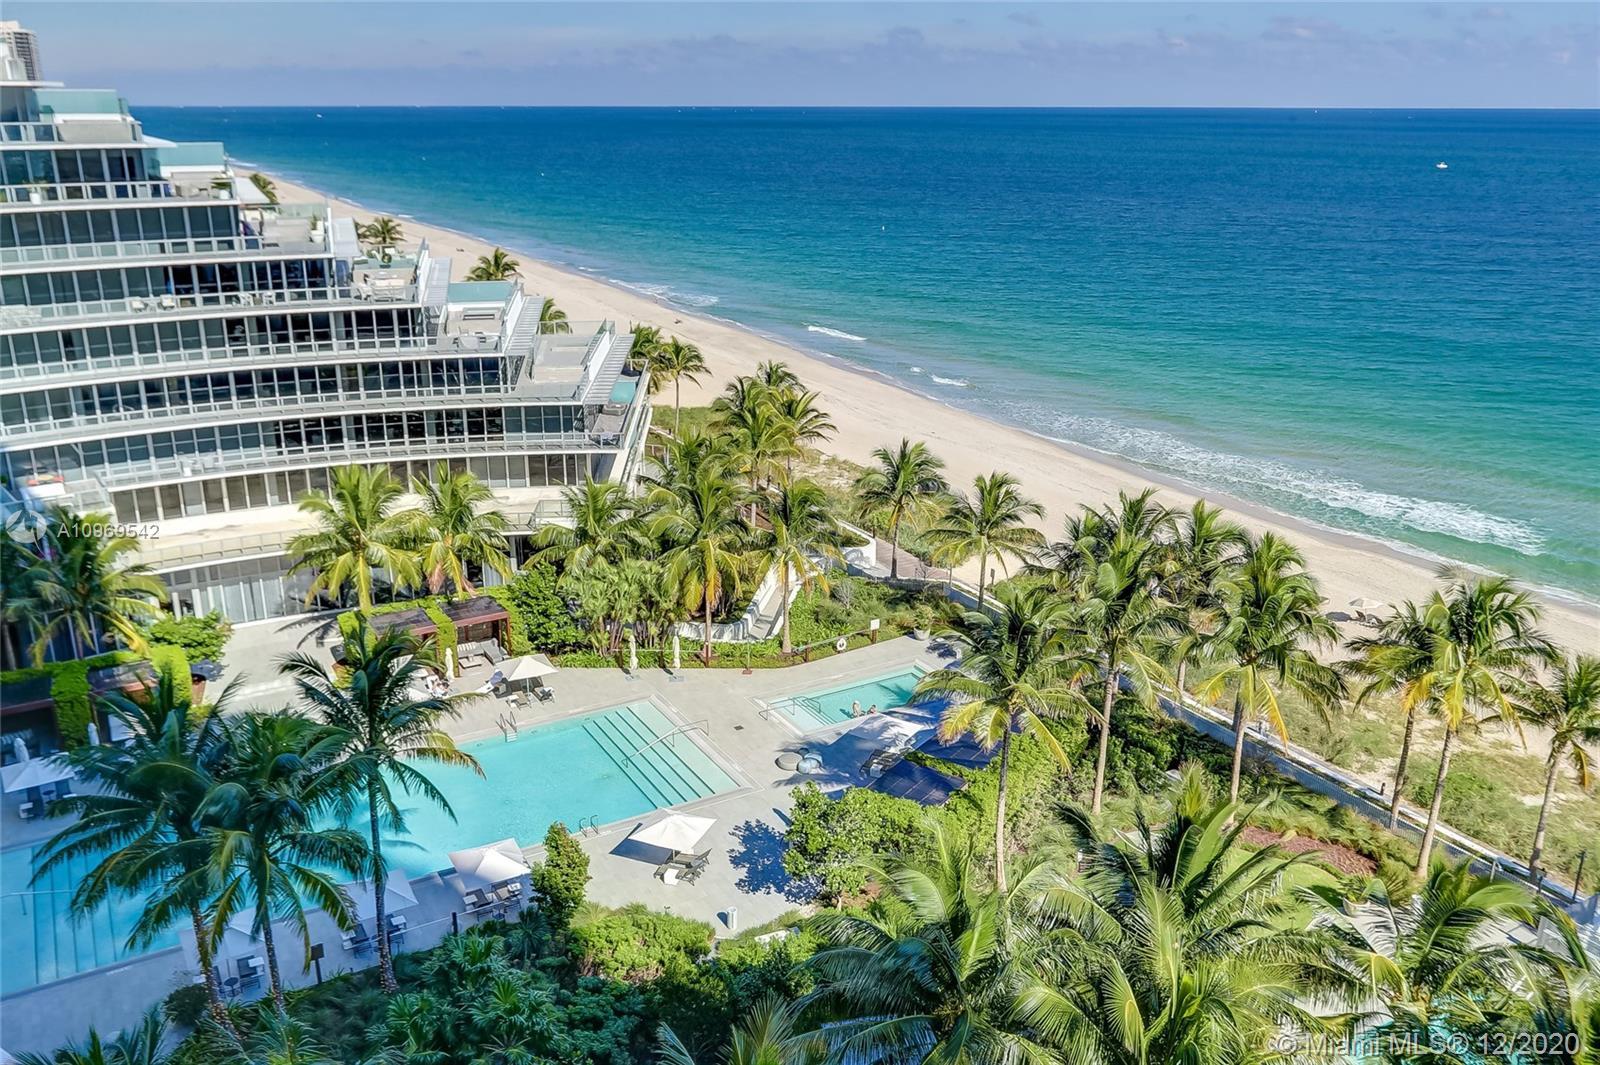 Auberge Beach Residences & Spa image #80